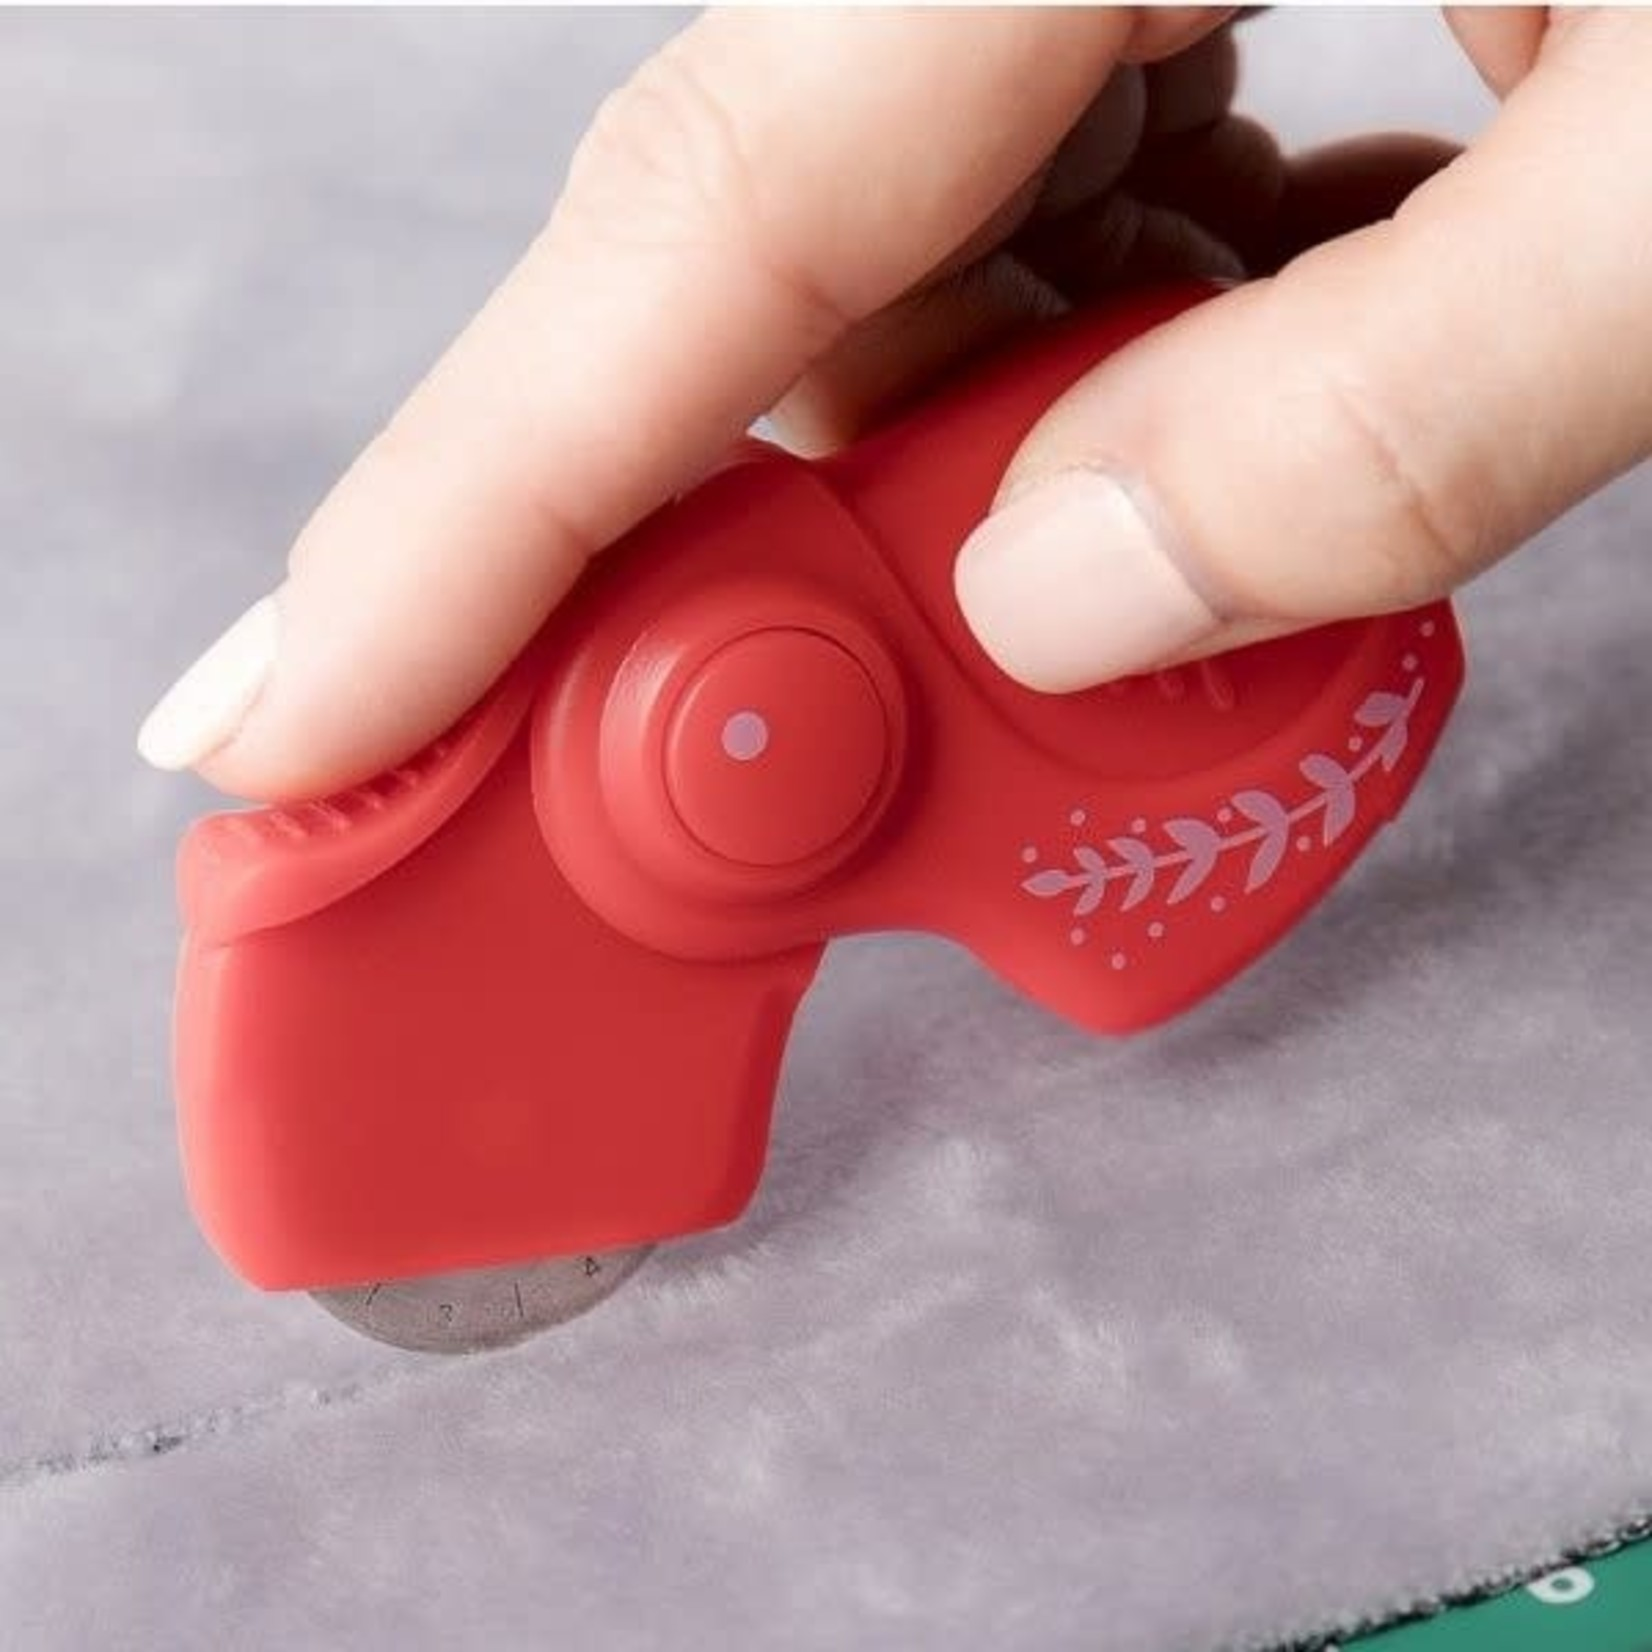 Sew Easy Rolmes - Pocket Rotary Cutter